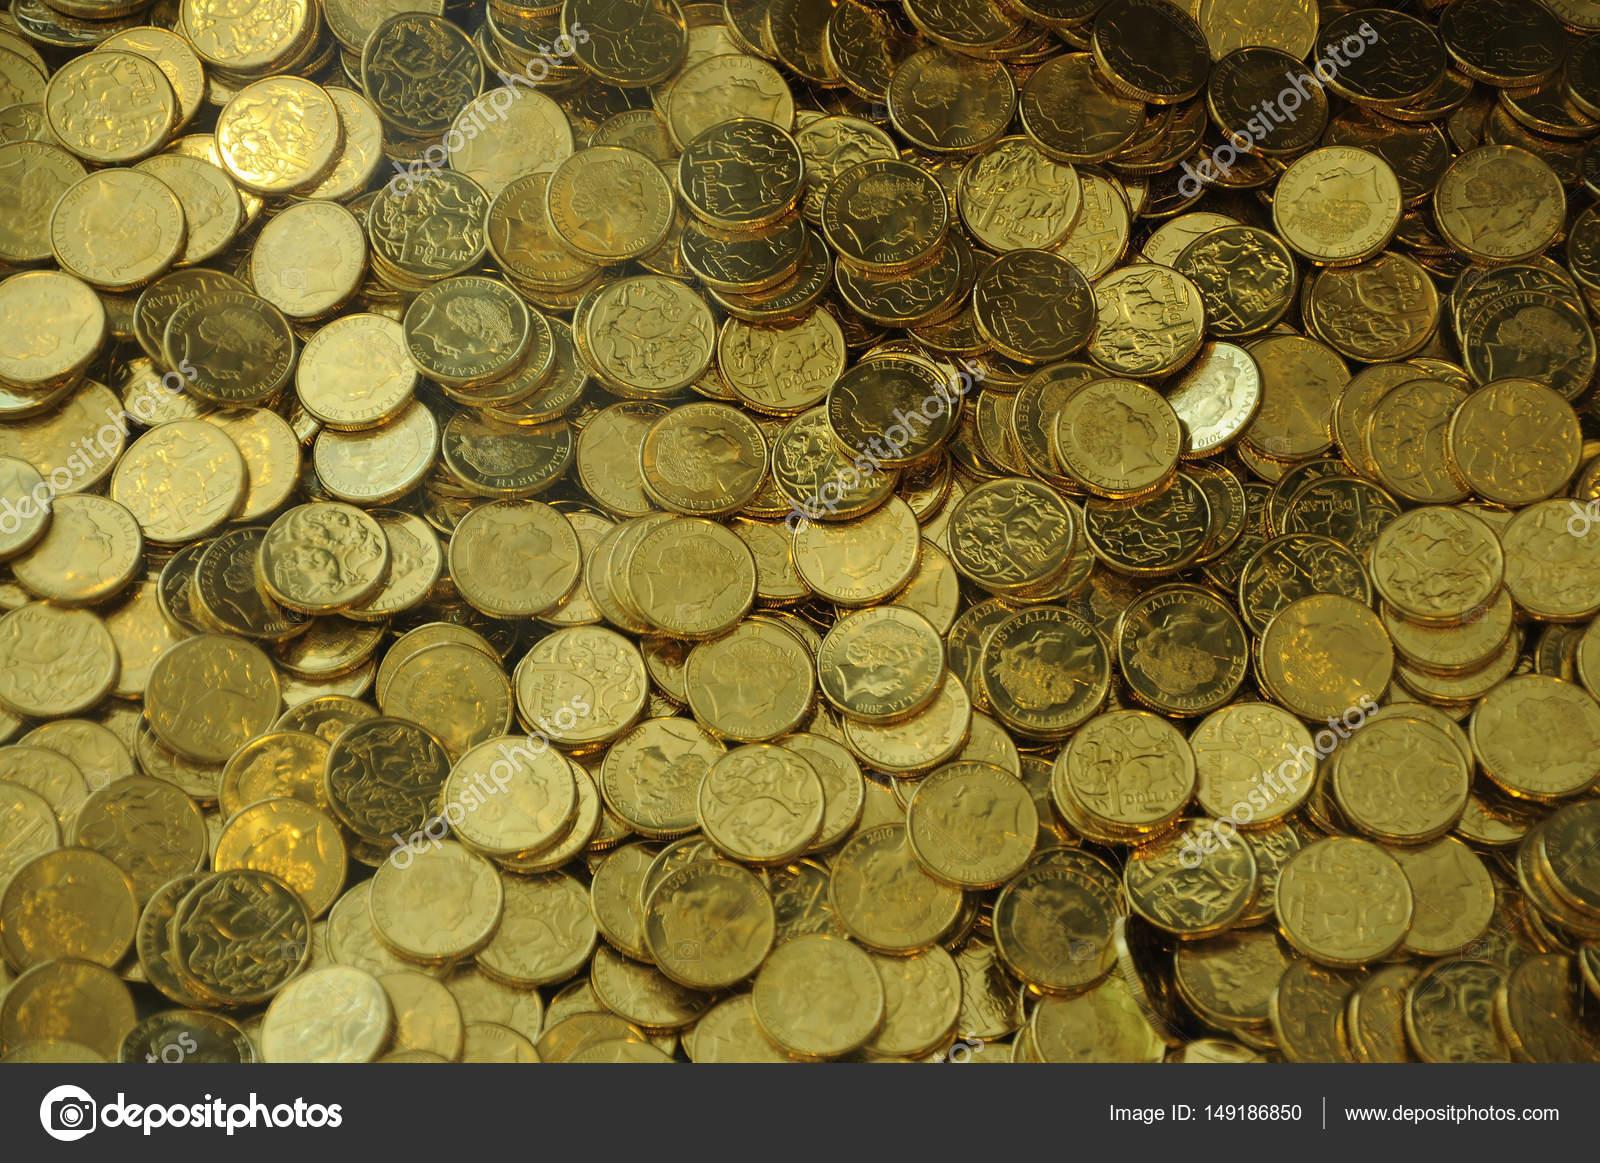 Australien 1 Dollar Münzen Stockfoto Viditaste At Gmailcom 149186850